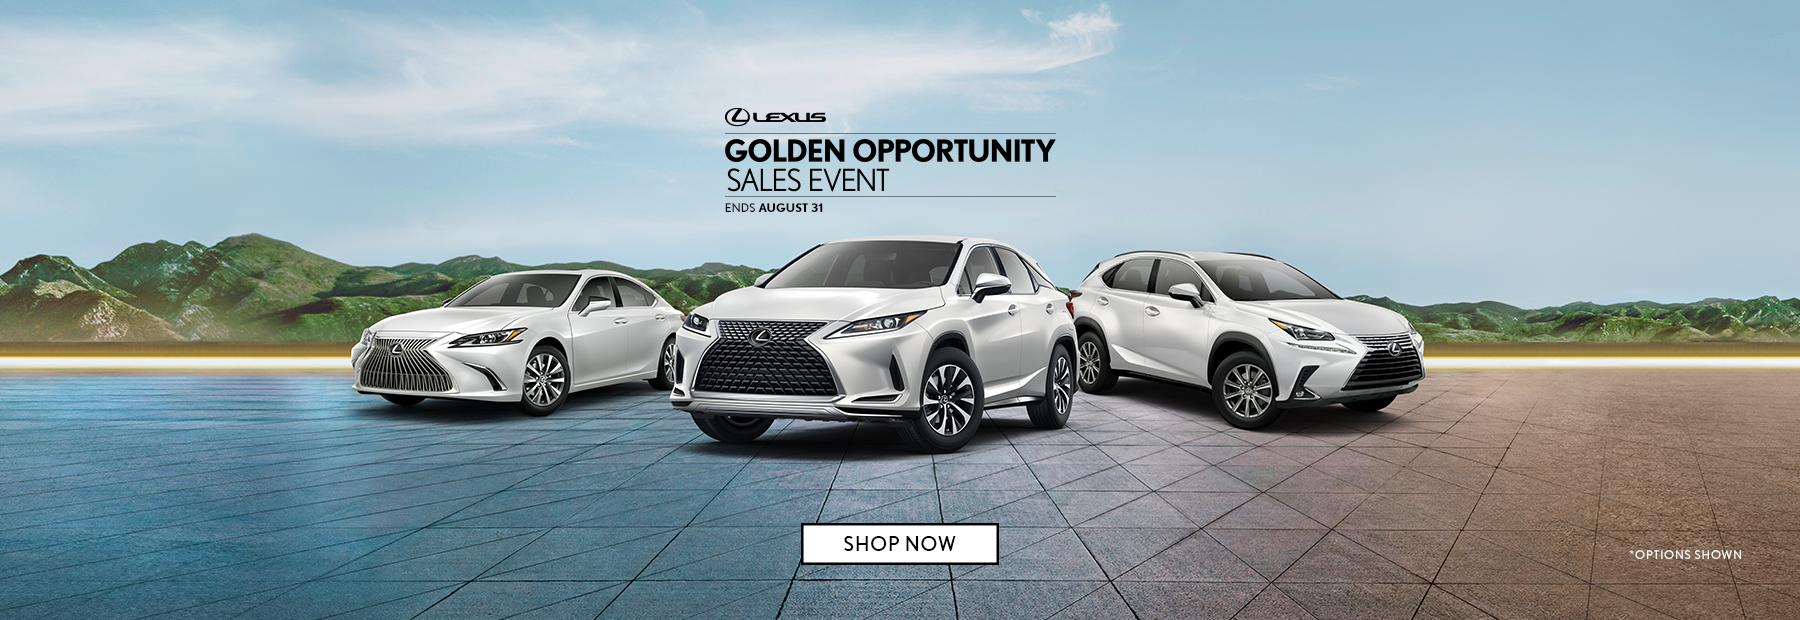 Lexus Golden Opportunity Sales Event. Ends August 31st.